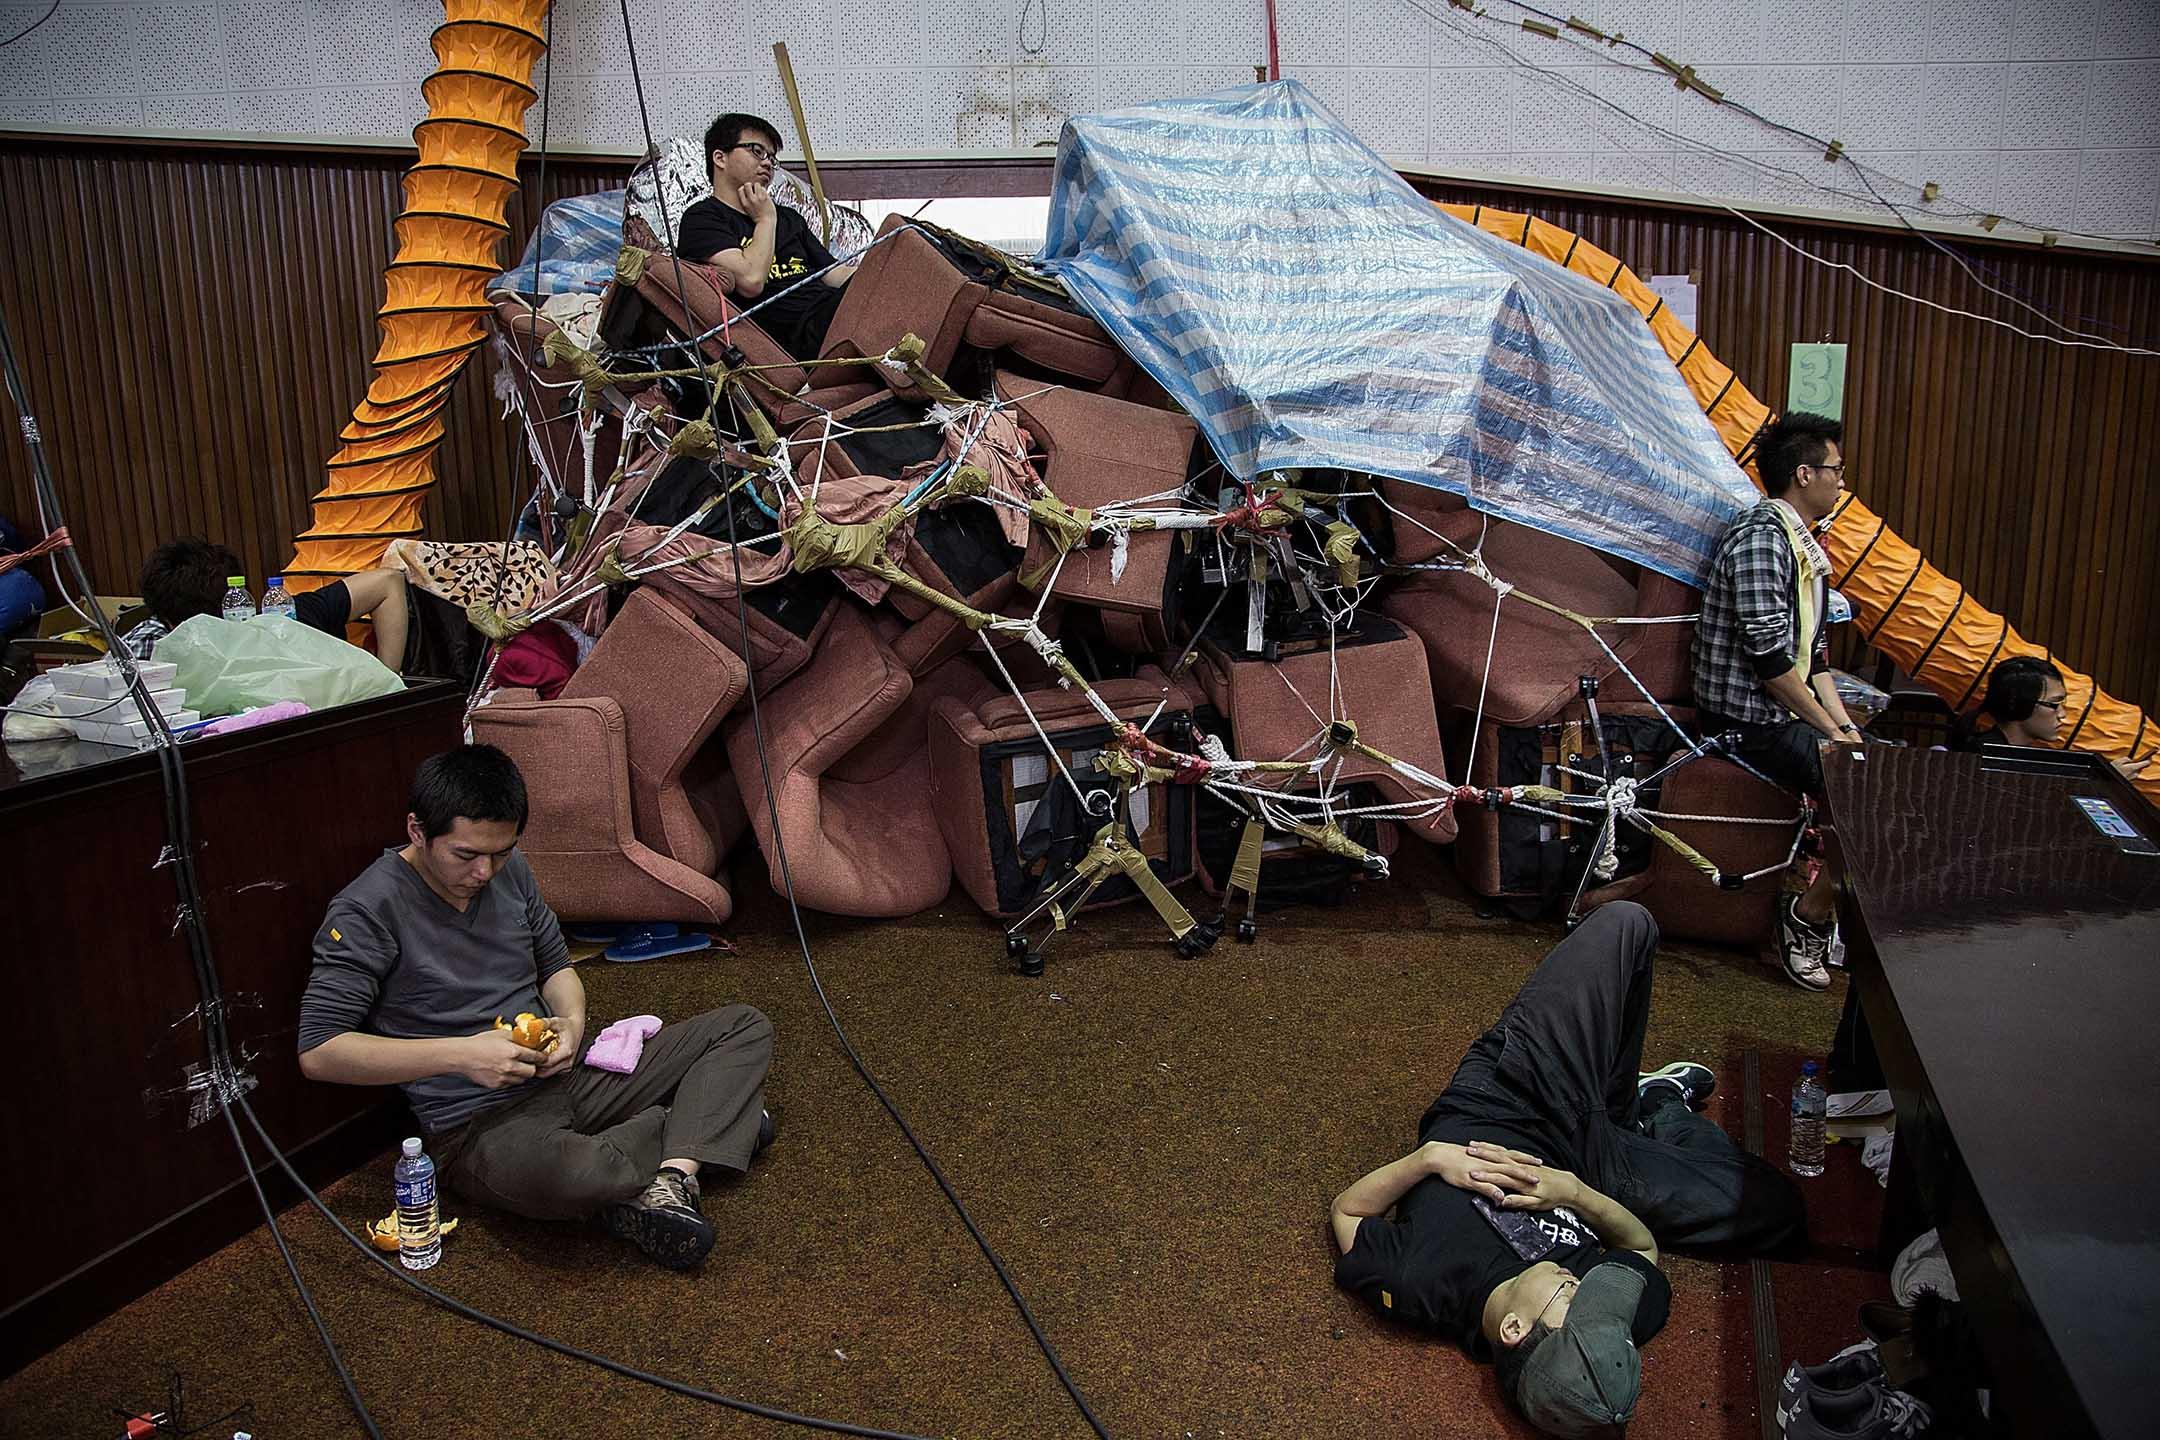 2014年3月26日,自2014年3月18日起台灣的學生佔領著立法院。 攝:Lam Yik Fei/Getty Images